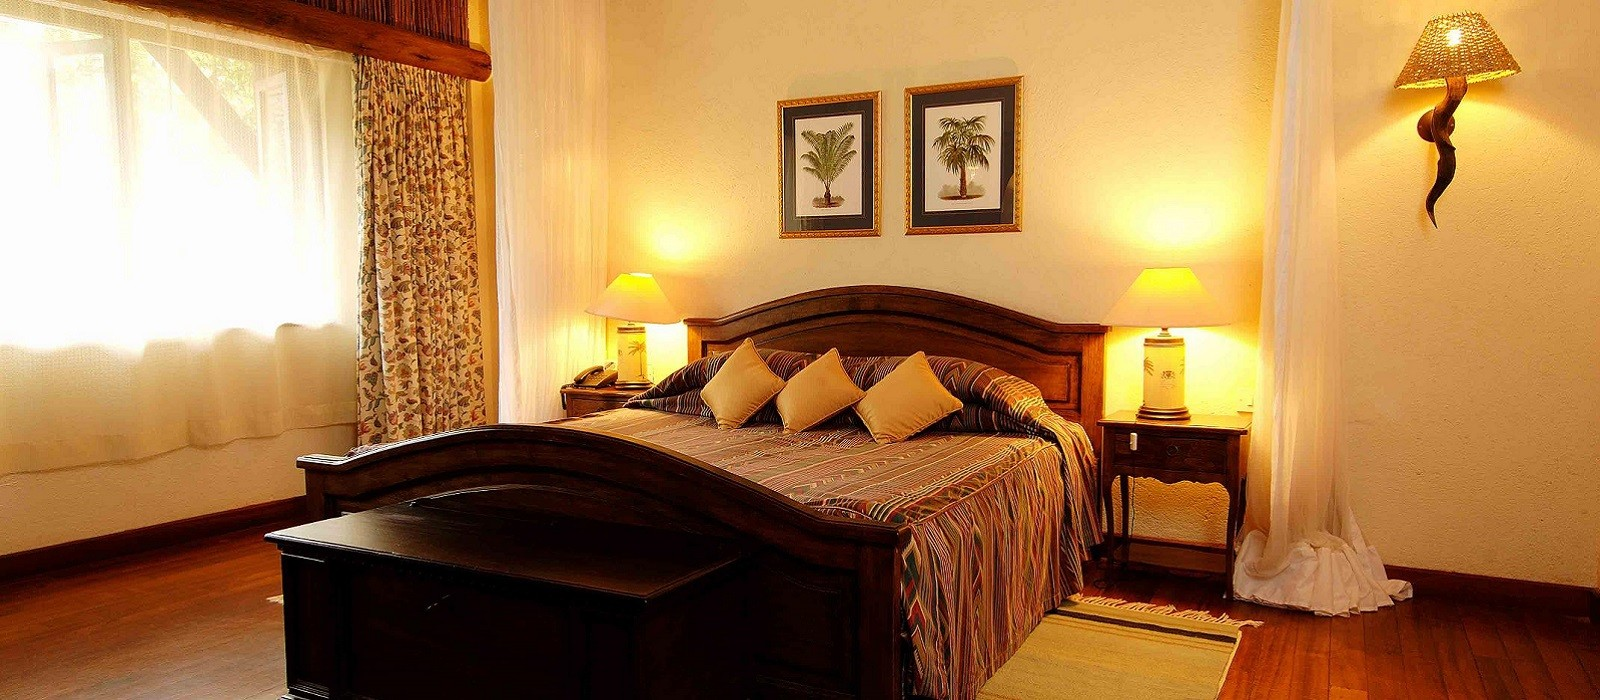 Hotel Kilaguni Serena Safari Kenia